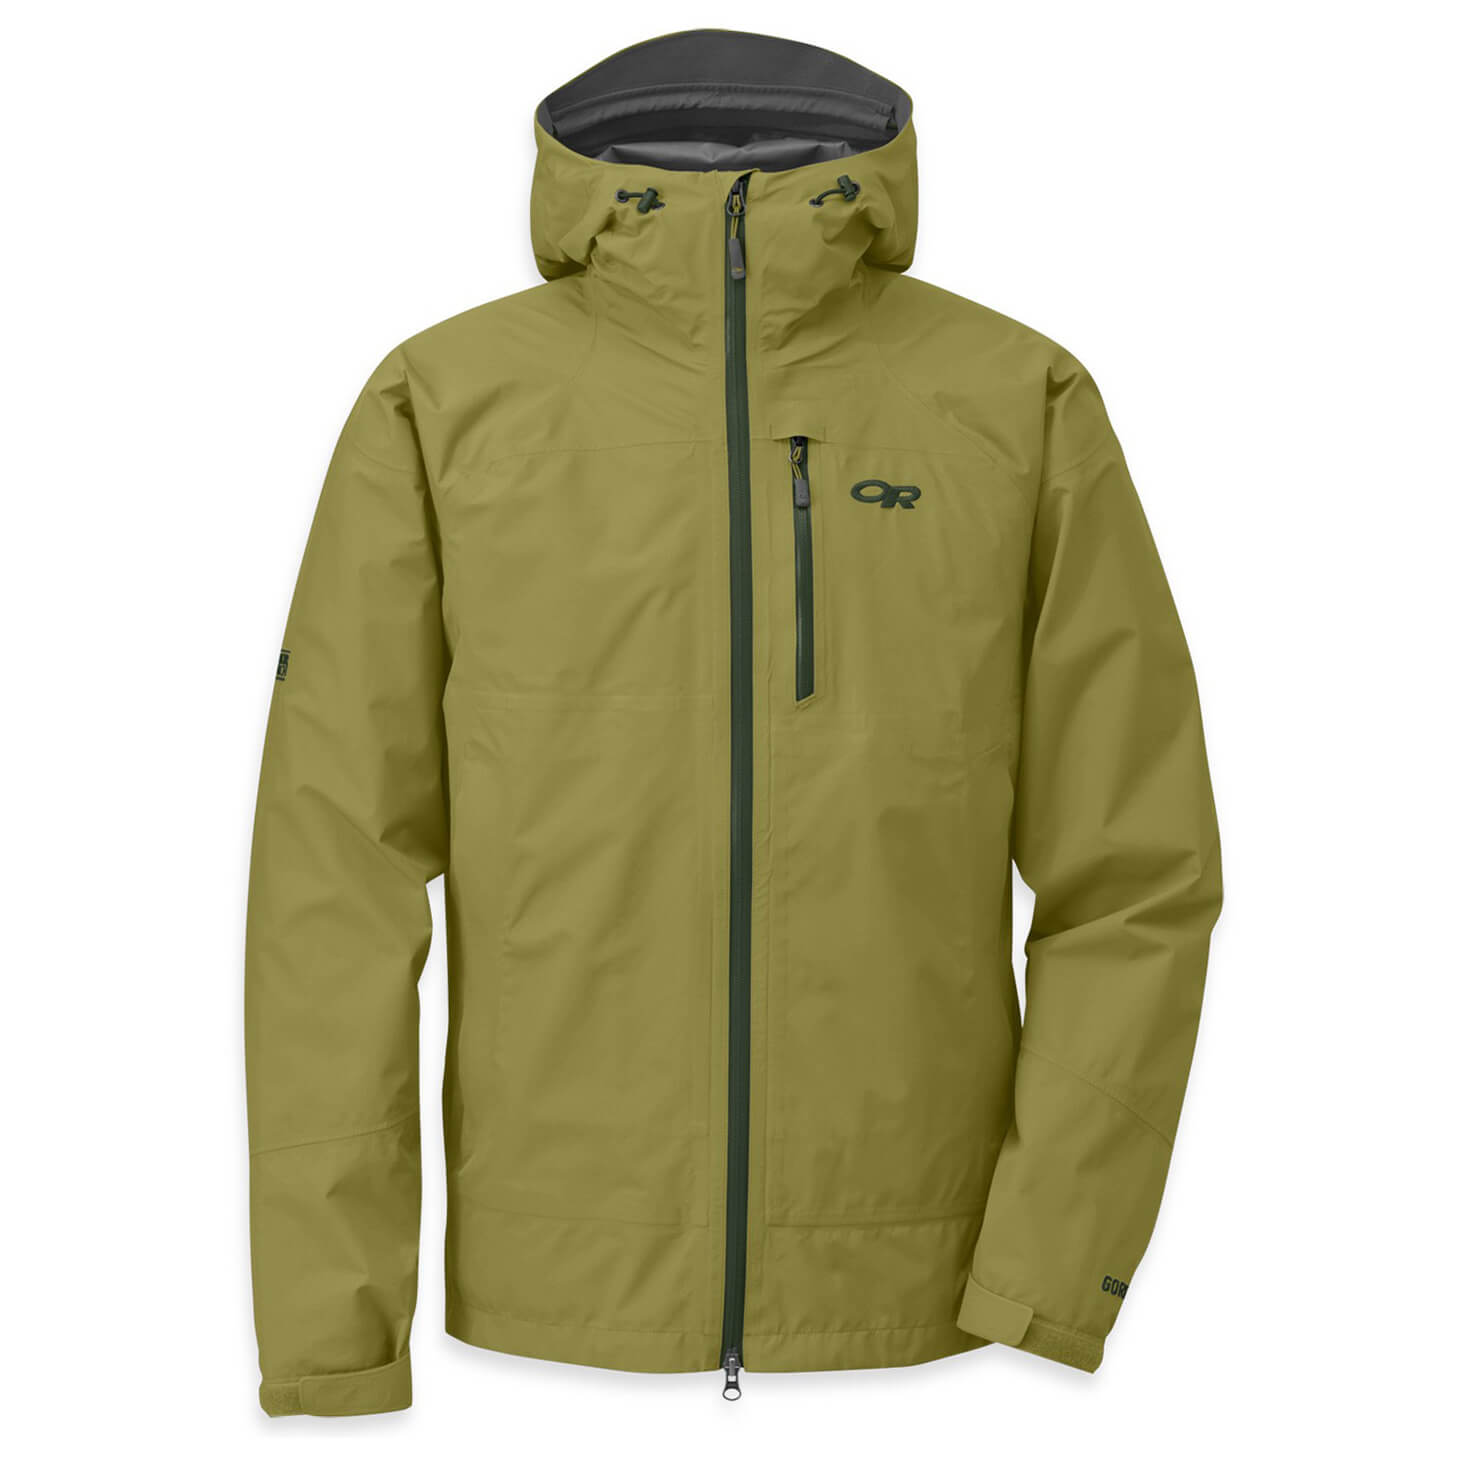 Outdoor Veste Research Foray Hardshell Jacket rvrzx0qw